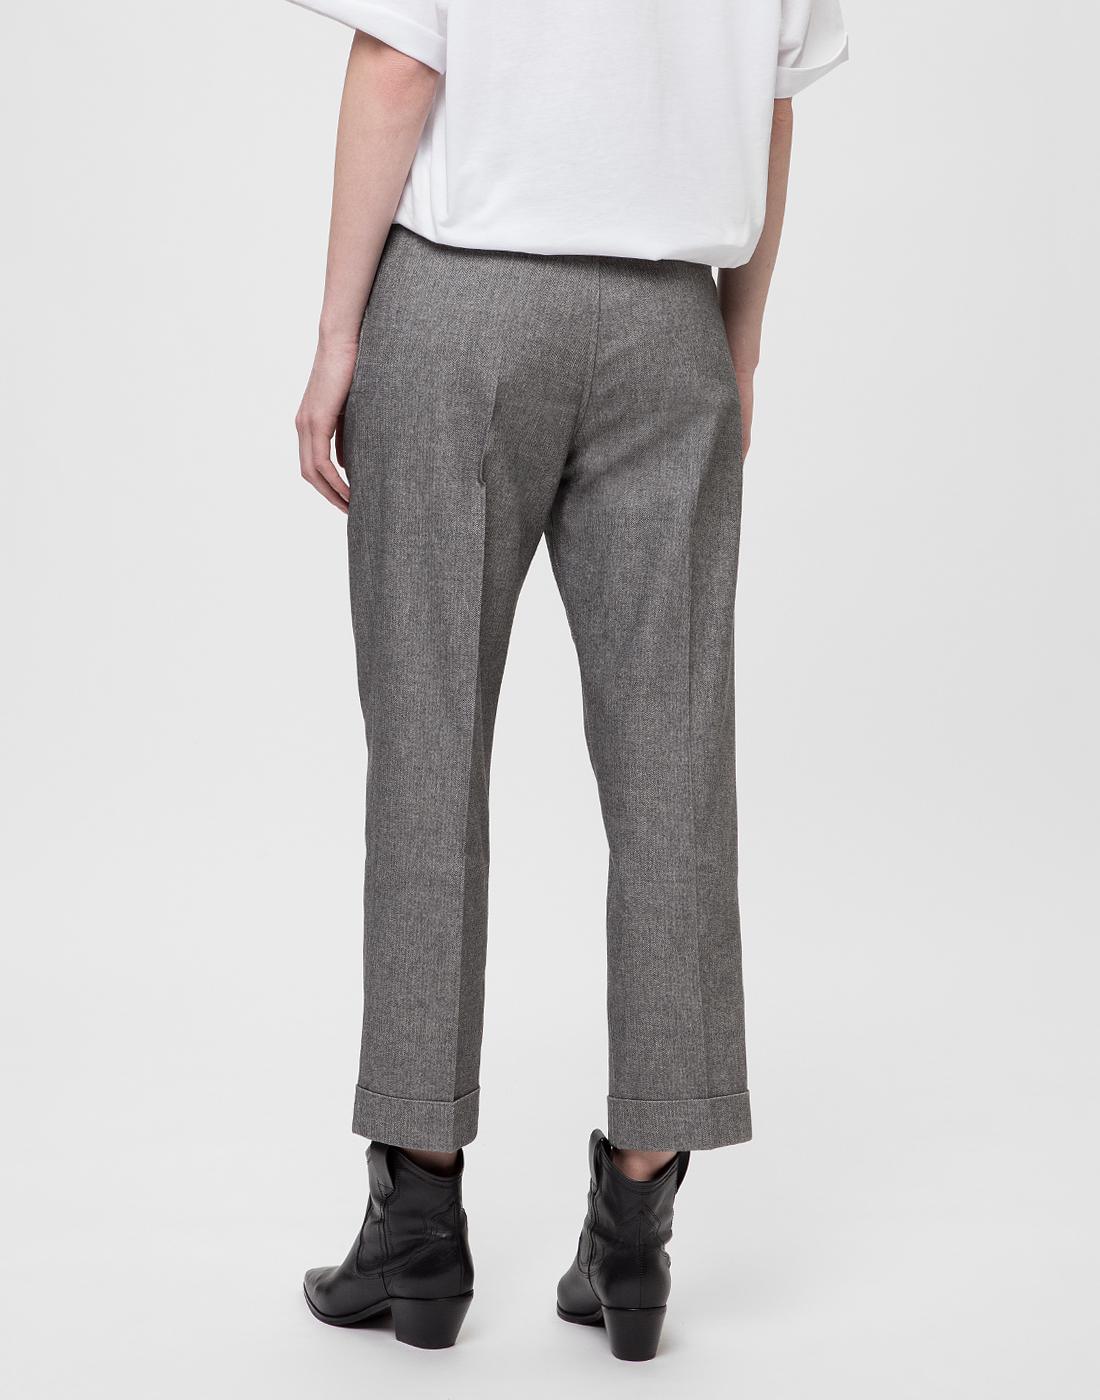 Женские серые брюки Tramarossa SO168-4